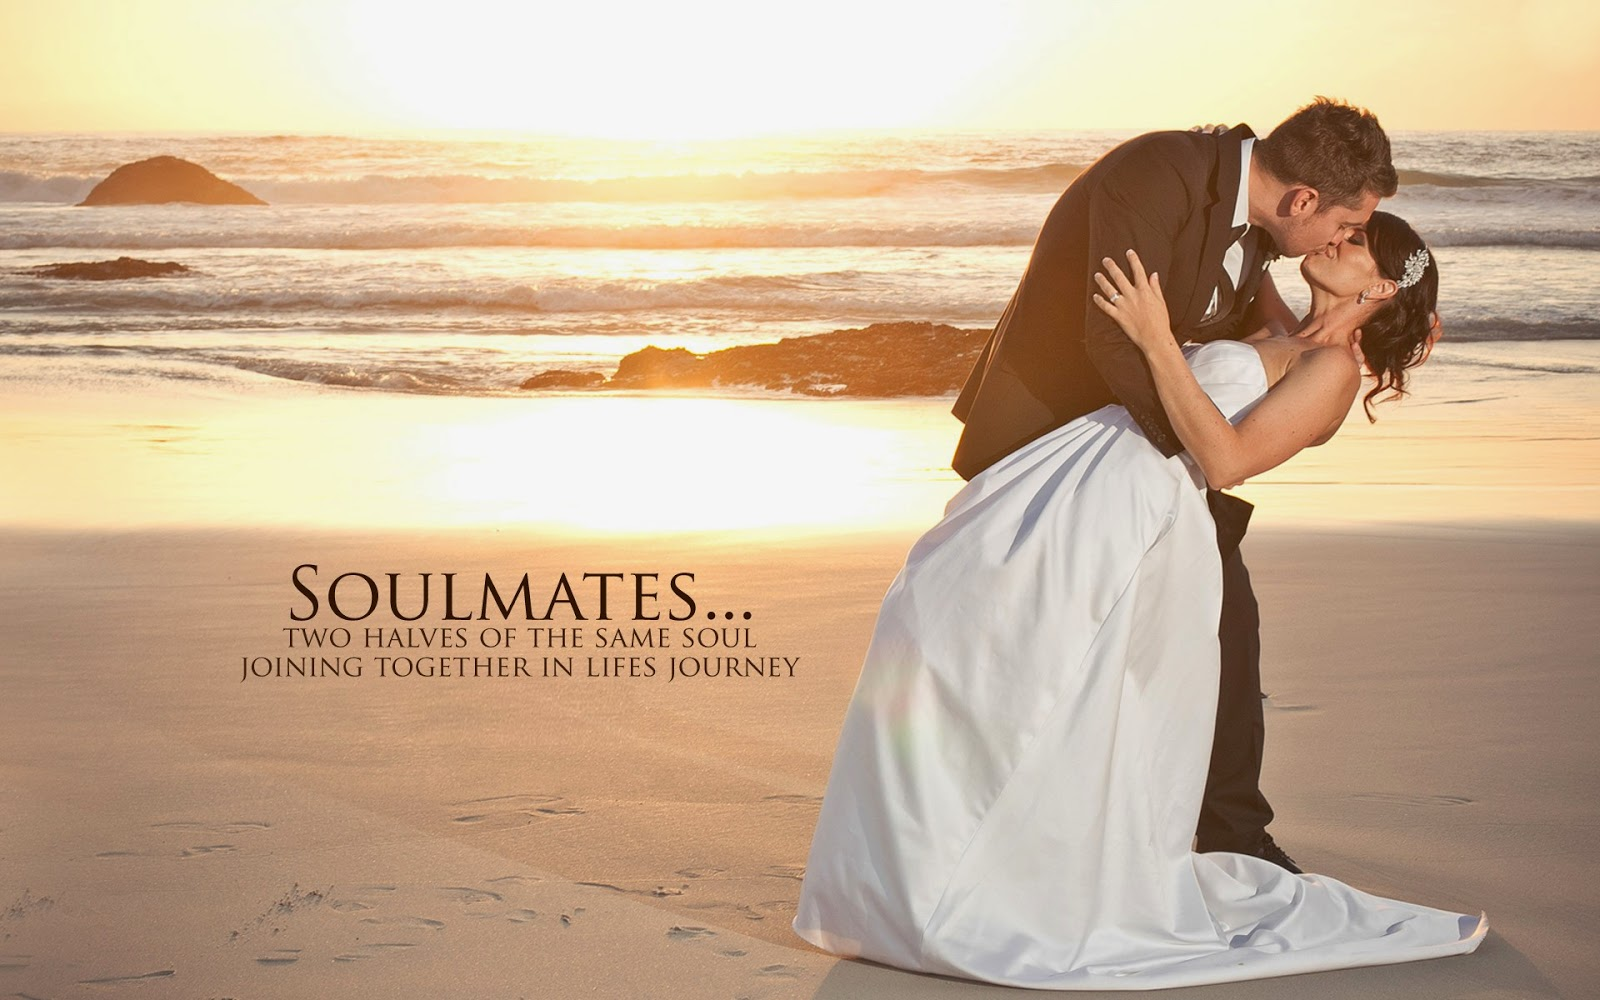 Happy Wedding Kissing Romantic Couple - romantic wedding wallpaper